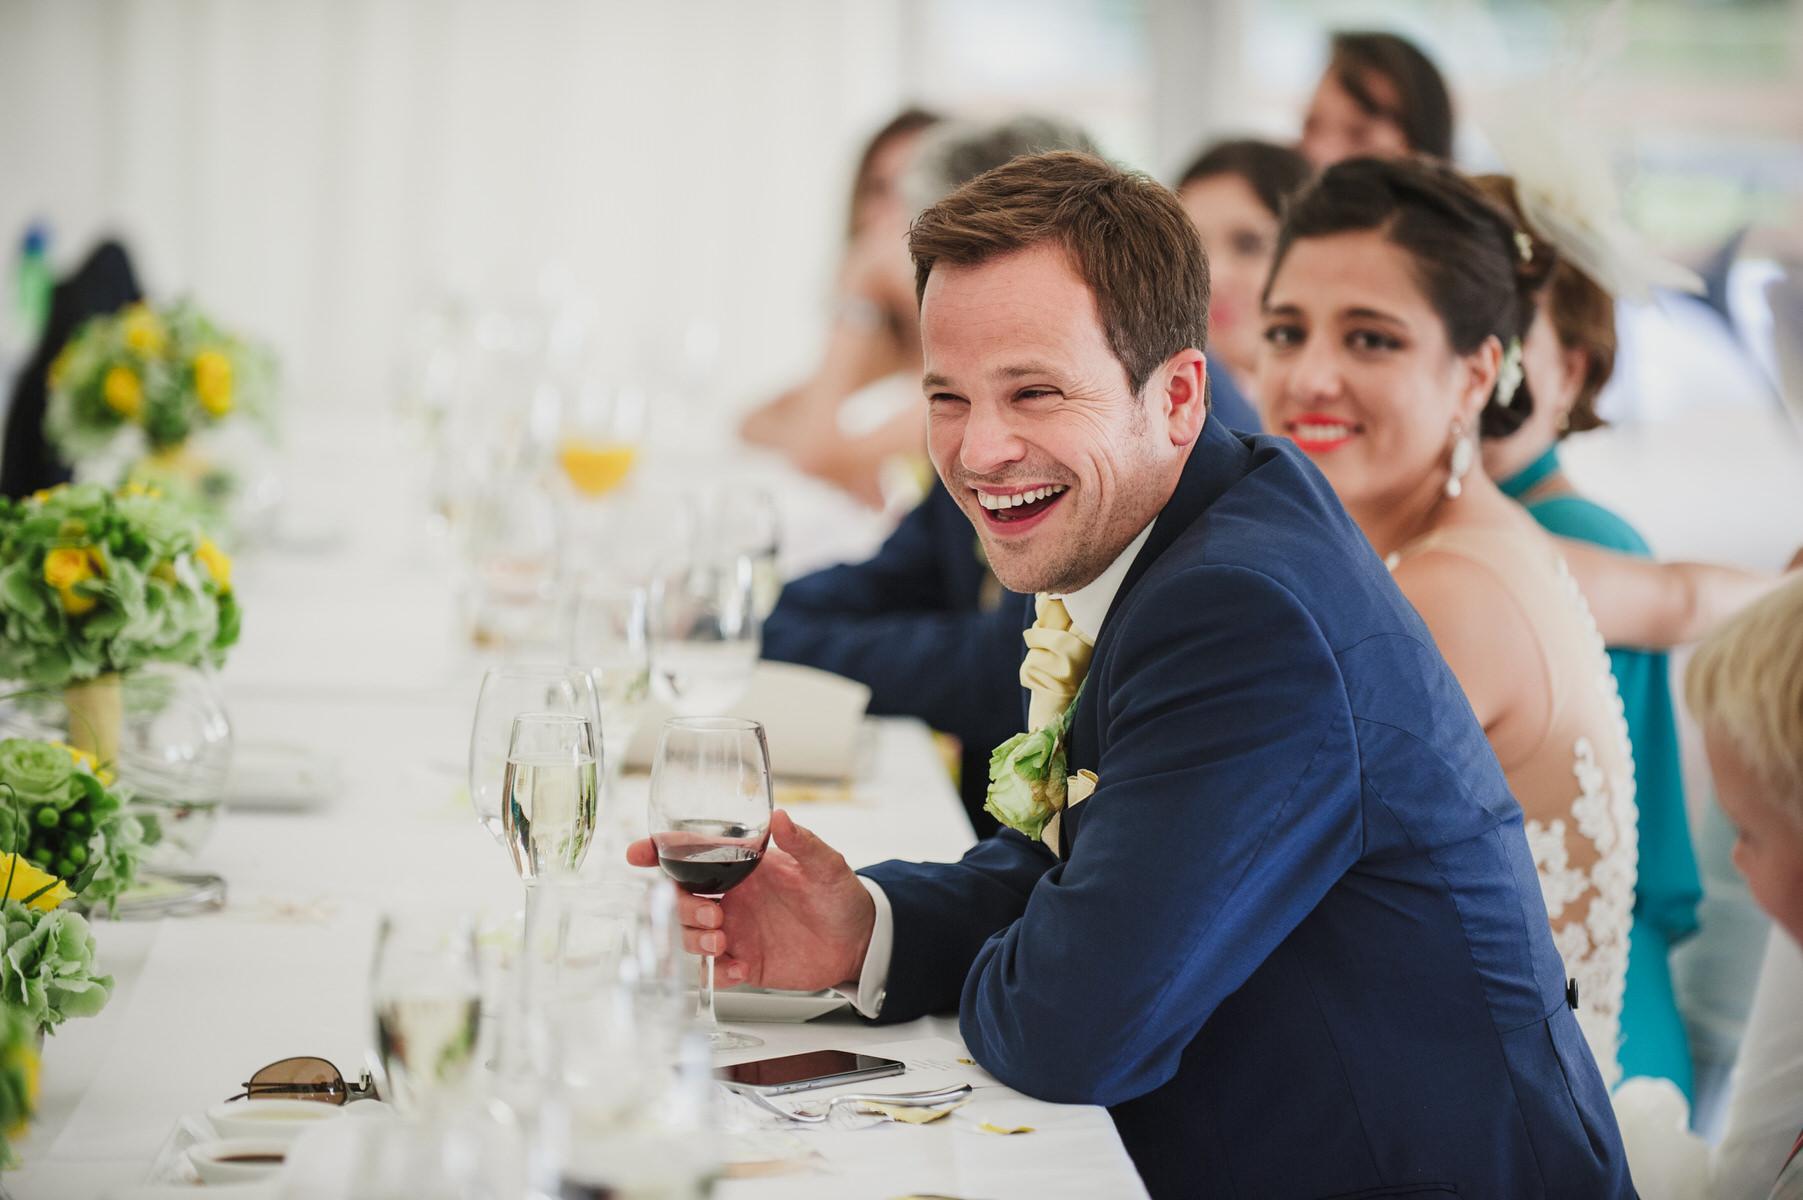 Ravens Ait wedding venue speeches